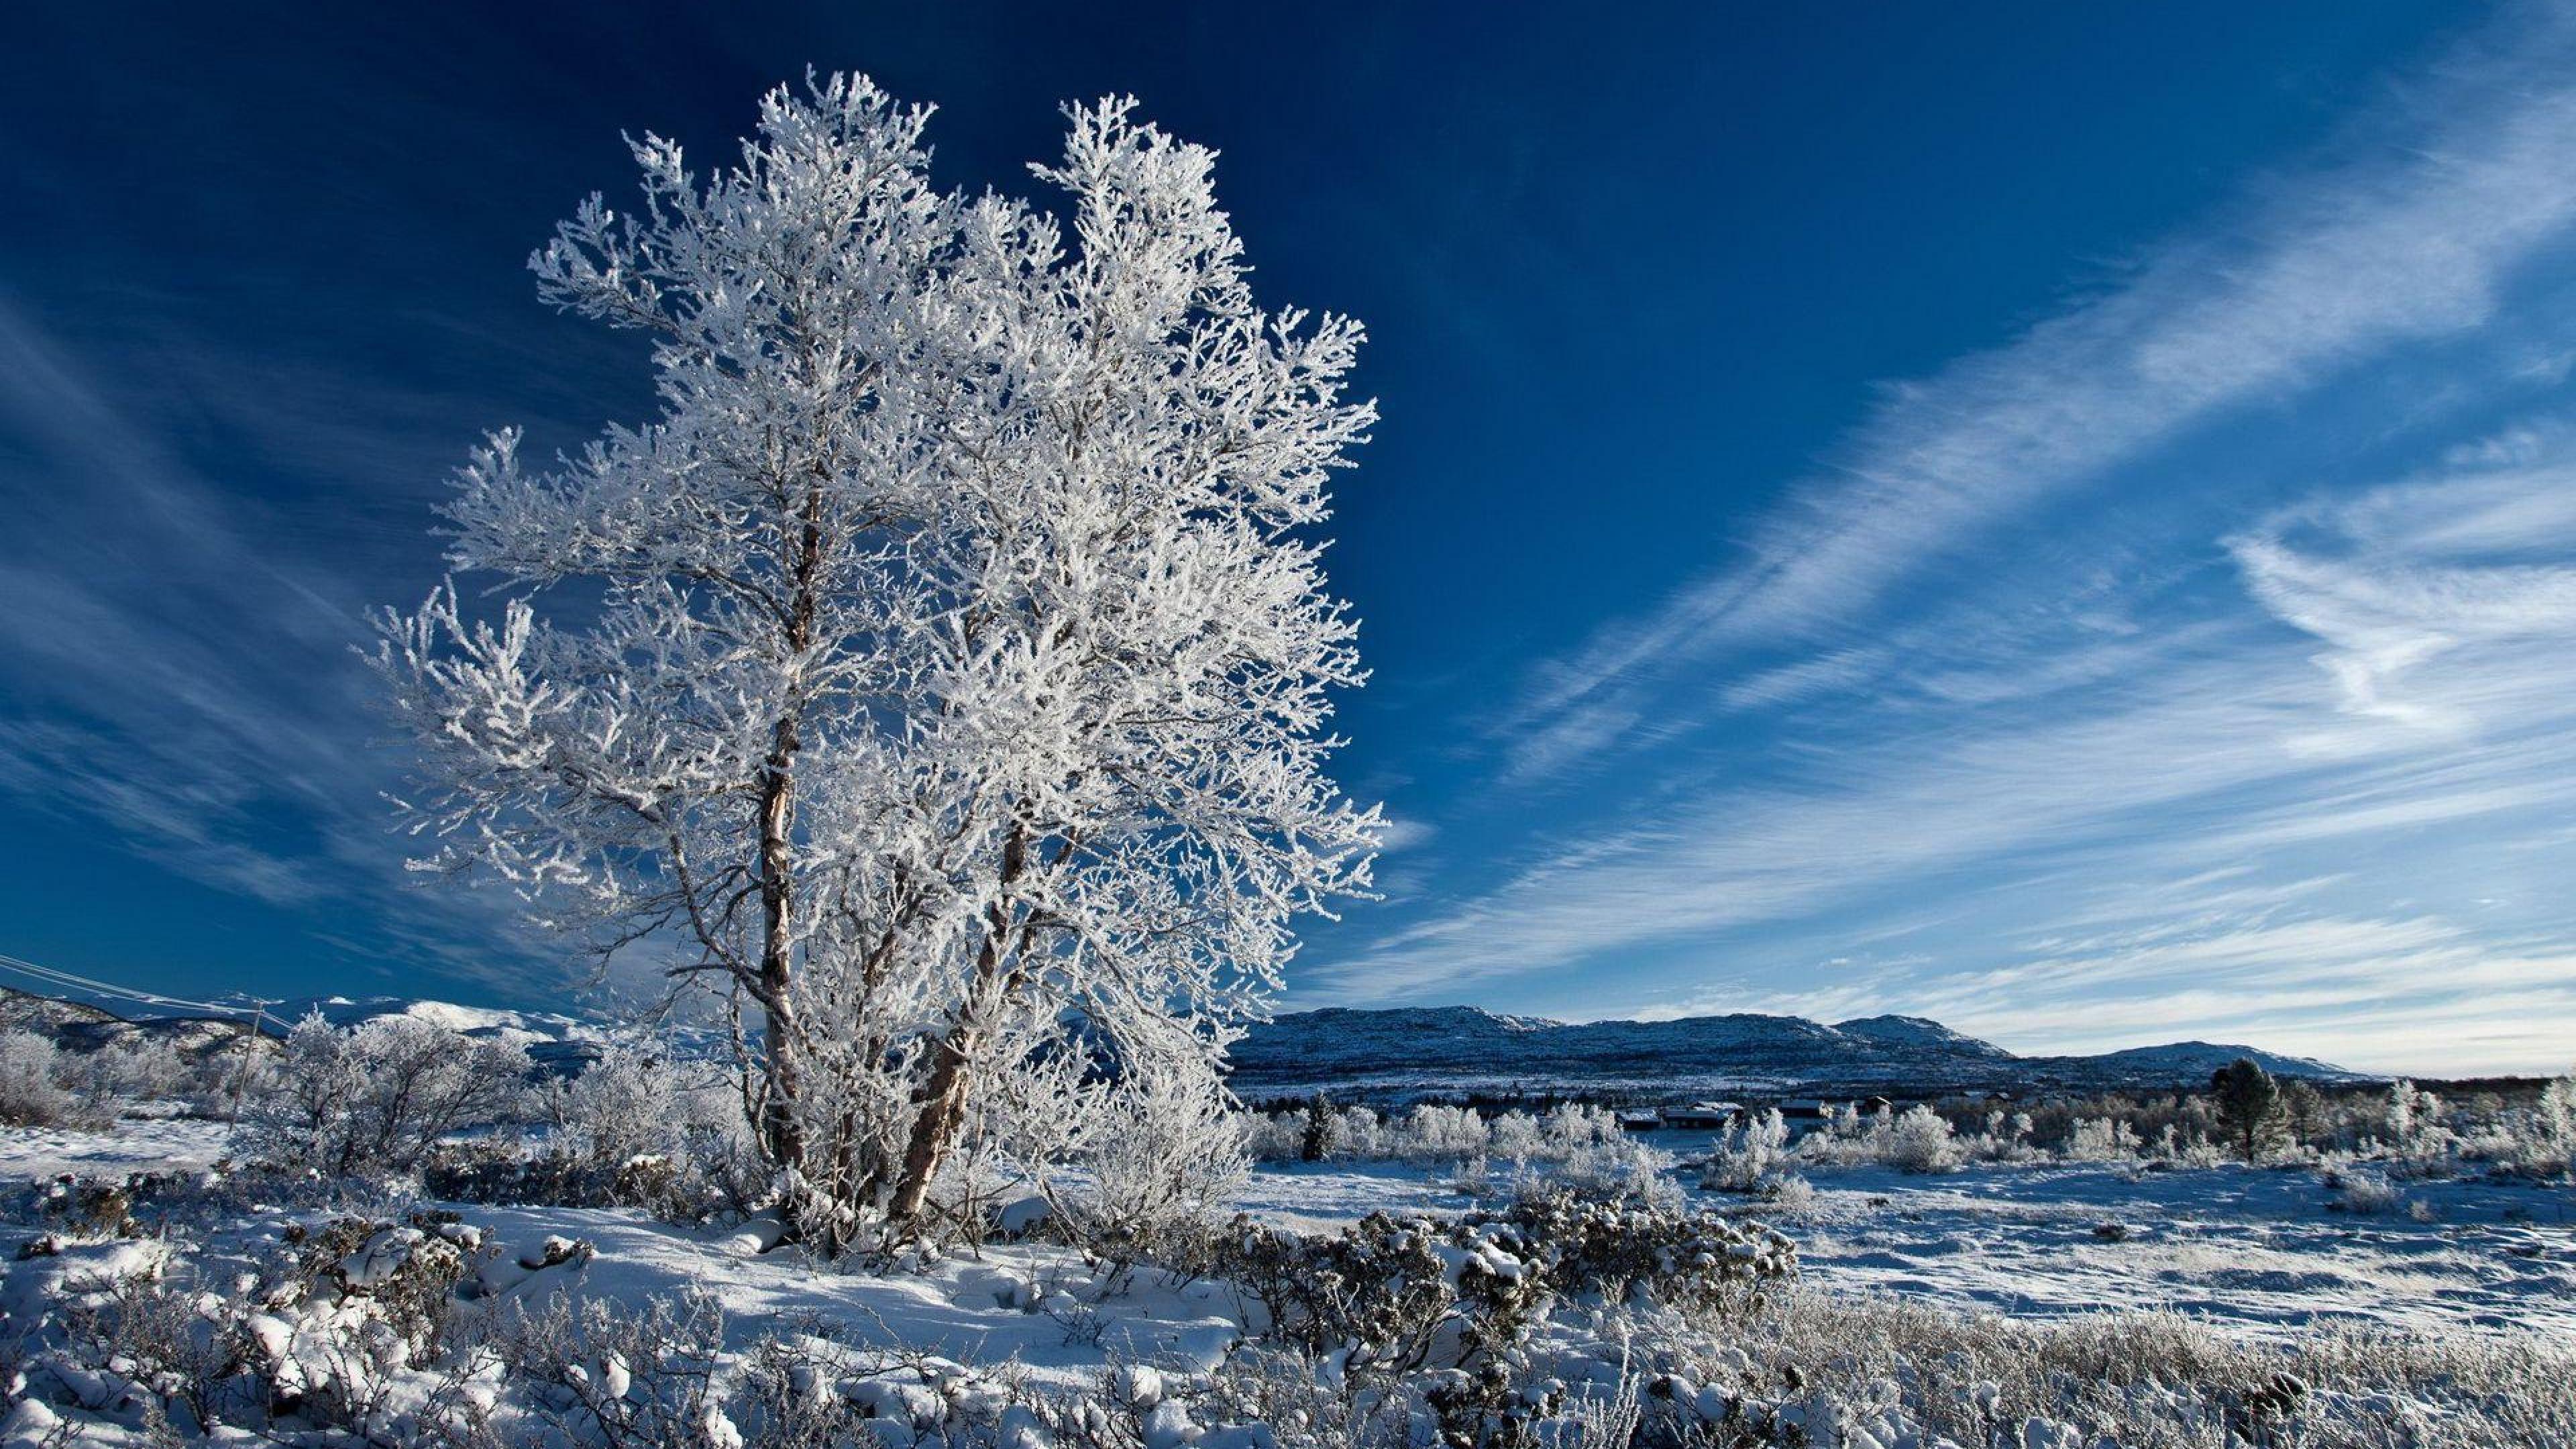 4k 16 9 winter wallpapers top free 4k 16 9 winter - Nature wallpaper hd 16 9 ...